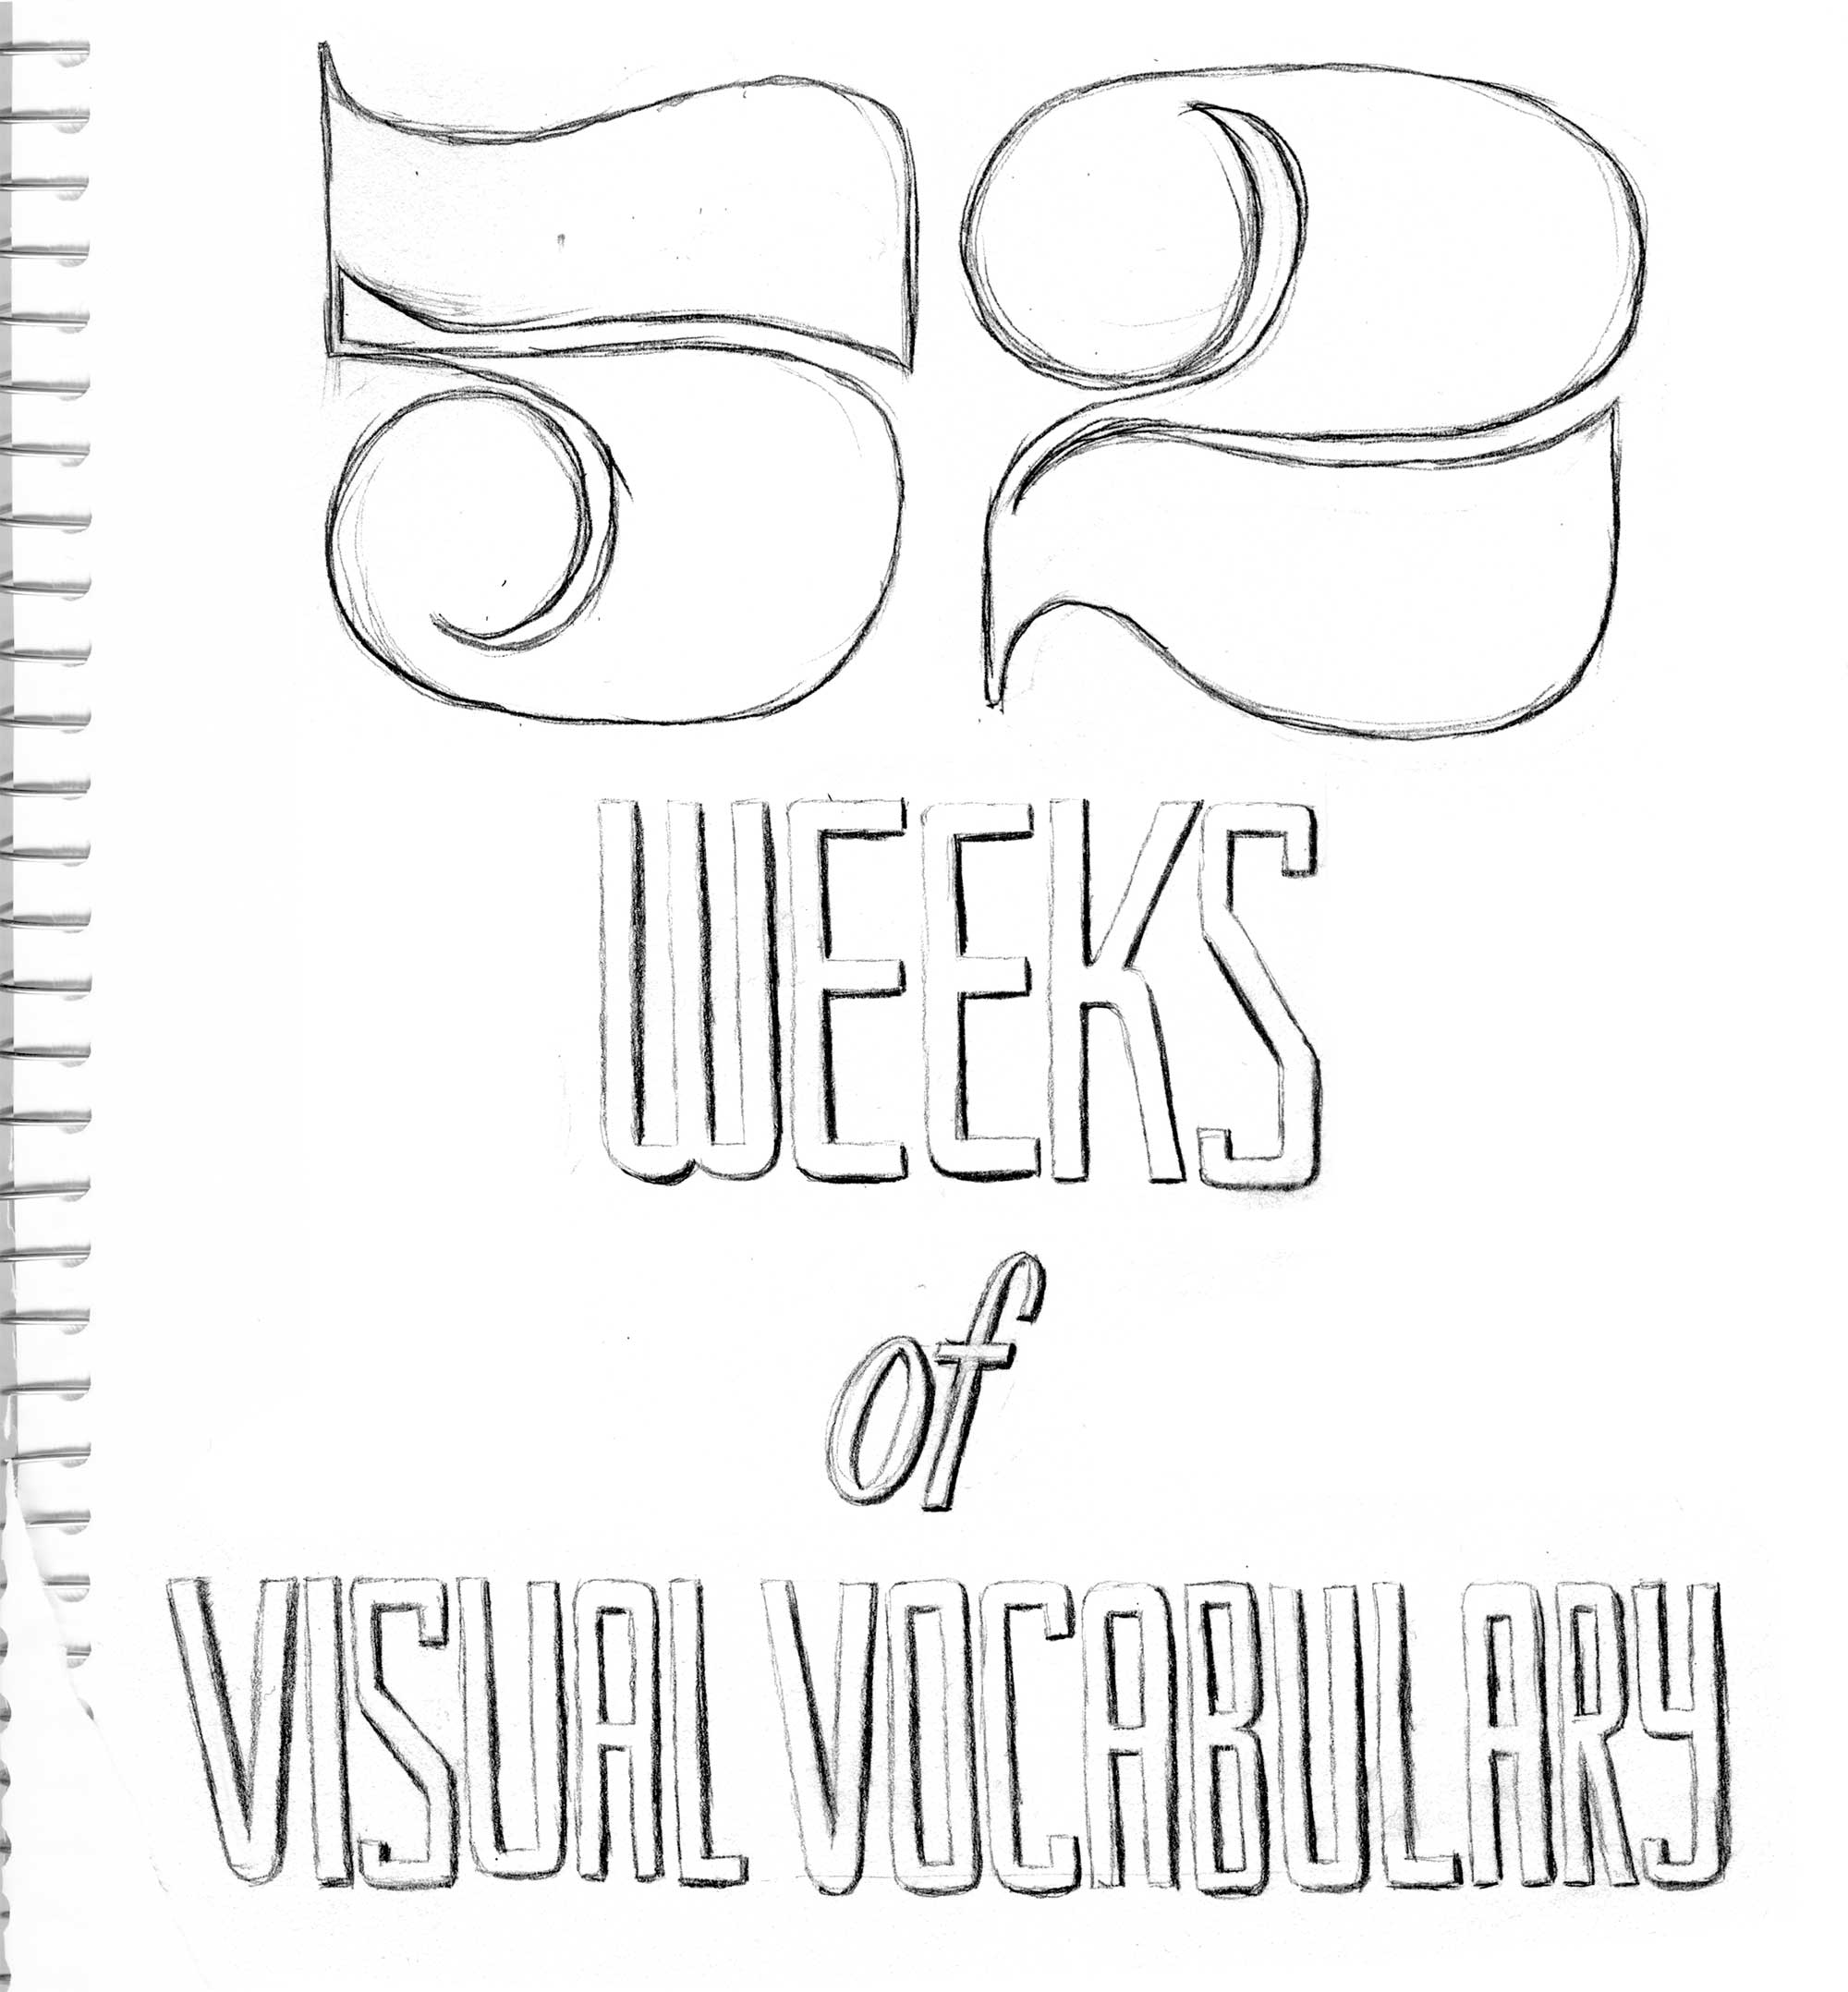 julie-rado-52-weeks-of-visual-vocabulary-sm.jpg